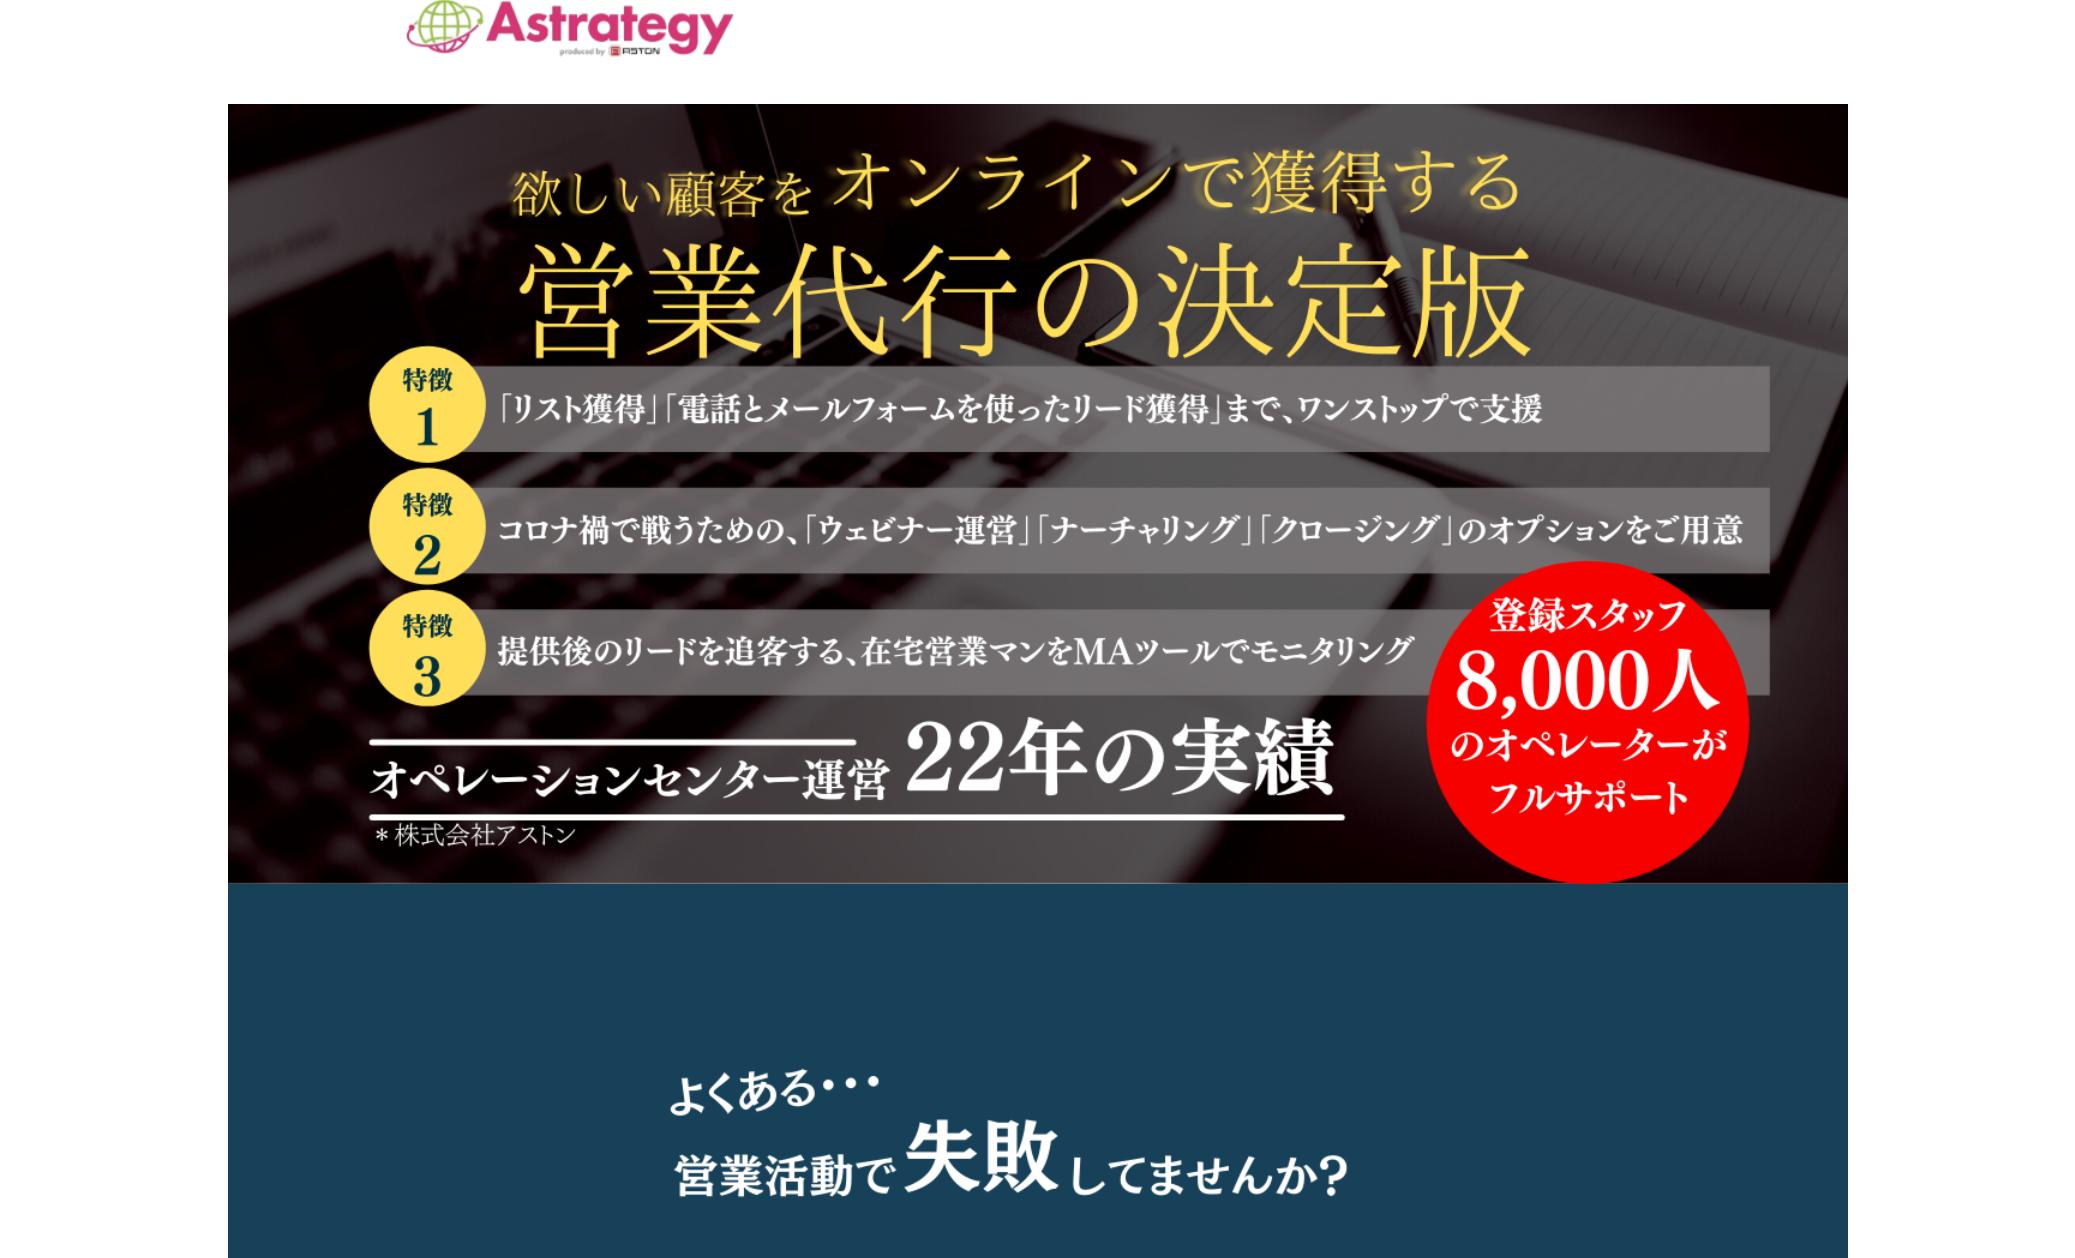 Astrategyのランディングページ